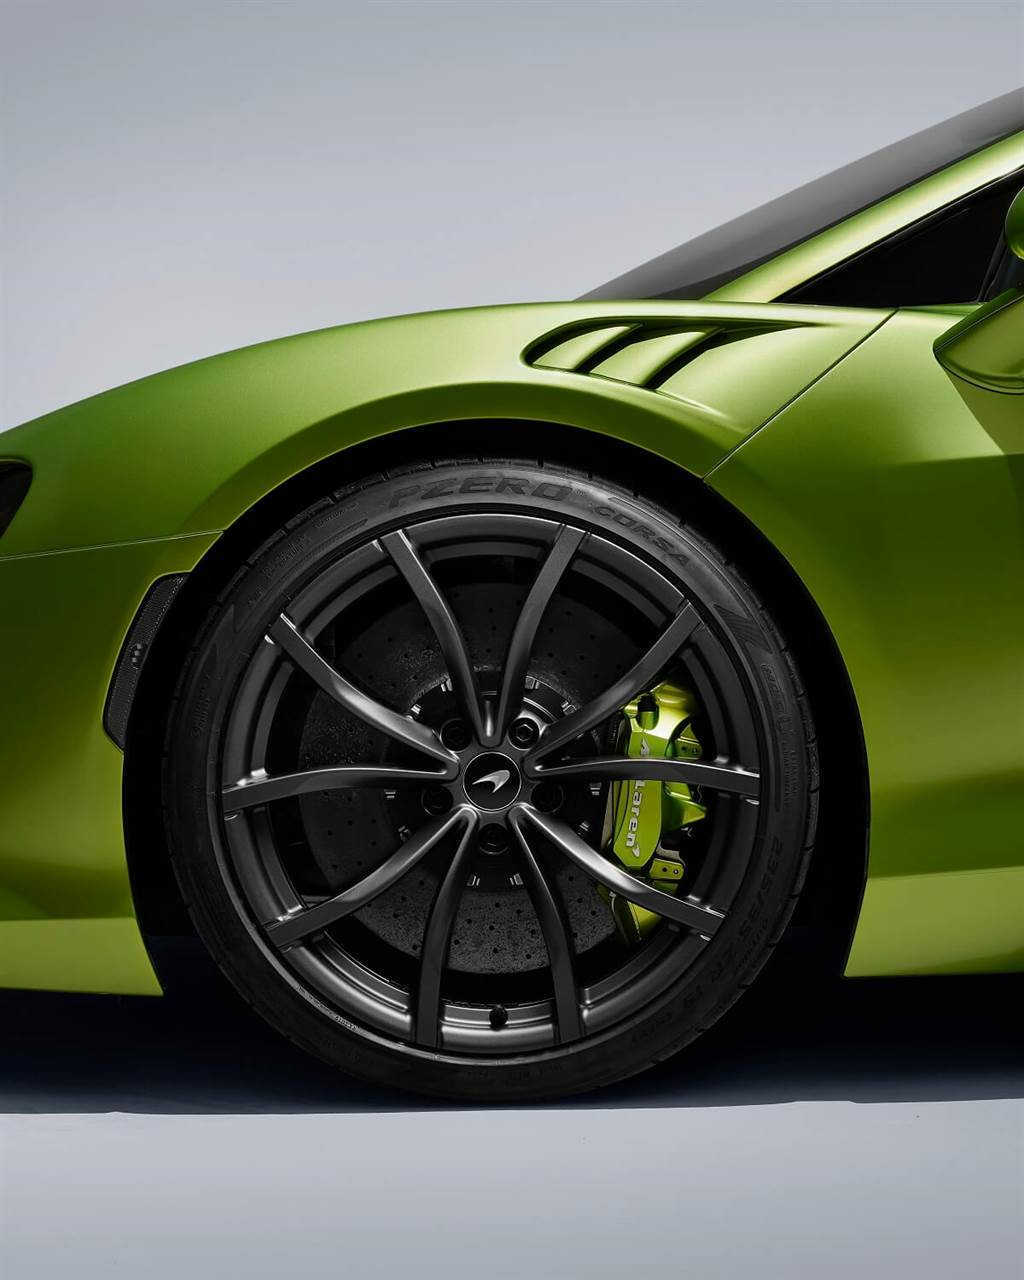 McLaren的輪胎合作夥伴Pirelli推出了三款定制輪胎(標配的標準型P-ZERO、賽道適用的P-ZER CORSA,以及P-ZERO WINTER冬季胎),其均標有「MC-C」,表示是為McLaren量身定制的新型Pirelli Cyber Tyre。其中創新的Pirelli Cyber Tyre系統可集成到車輛電控系統(包含不同的駕駛模式與動態穩定控制),而每個輪胎中都有一個電子芯片,並根據輪胎的具體情況生成即時數據流,該數據流再中繼到McLaren Artura的控制系統中以提供最佳輪胎性能。